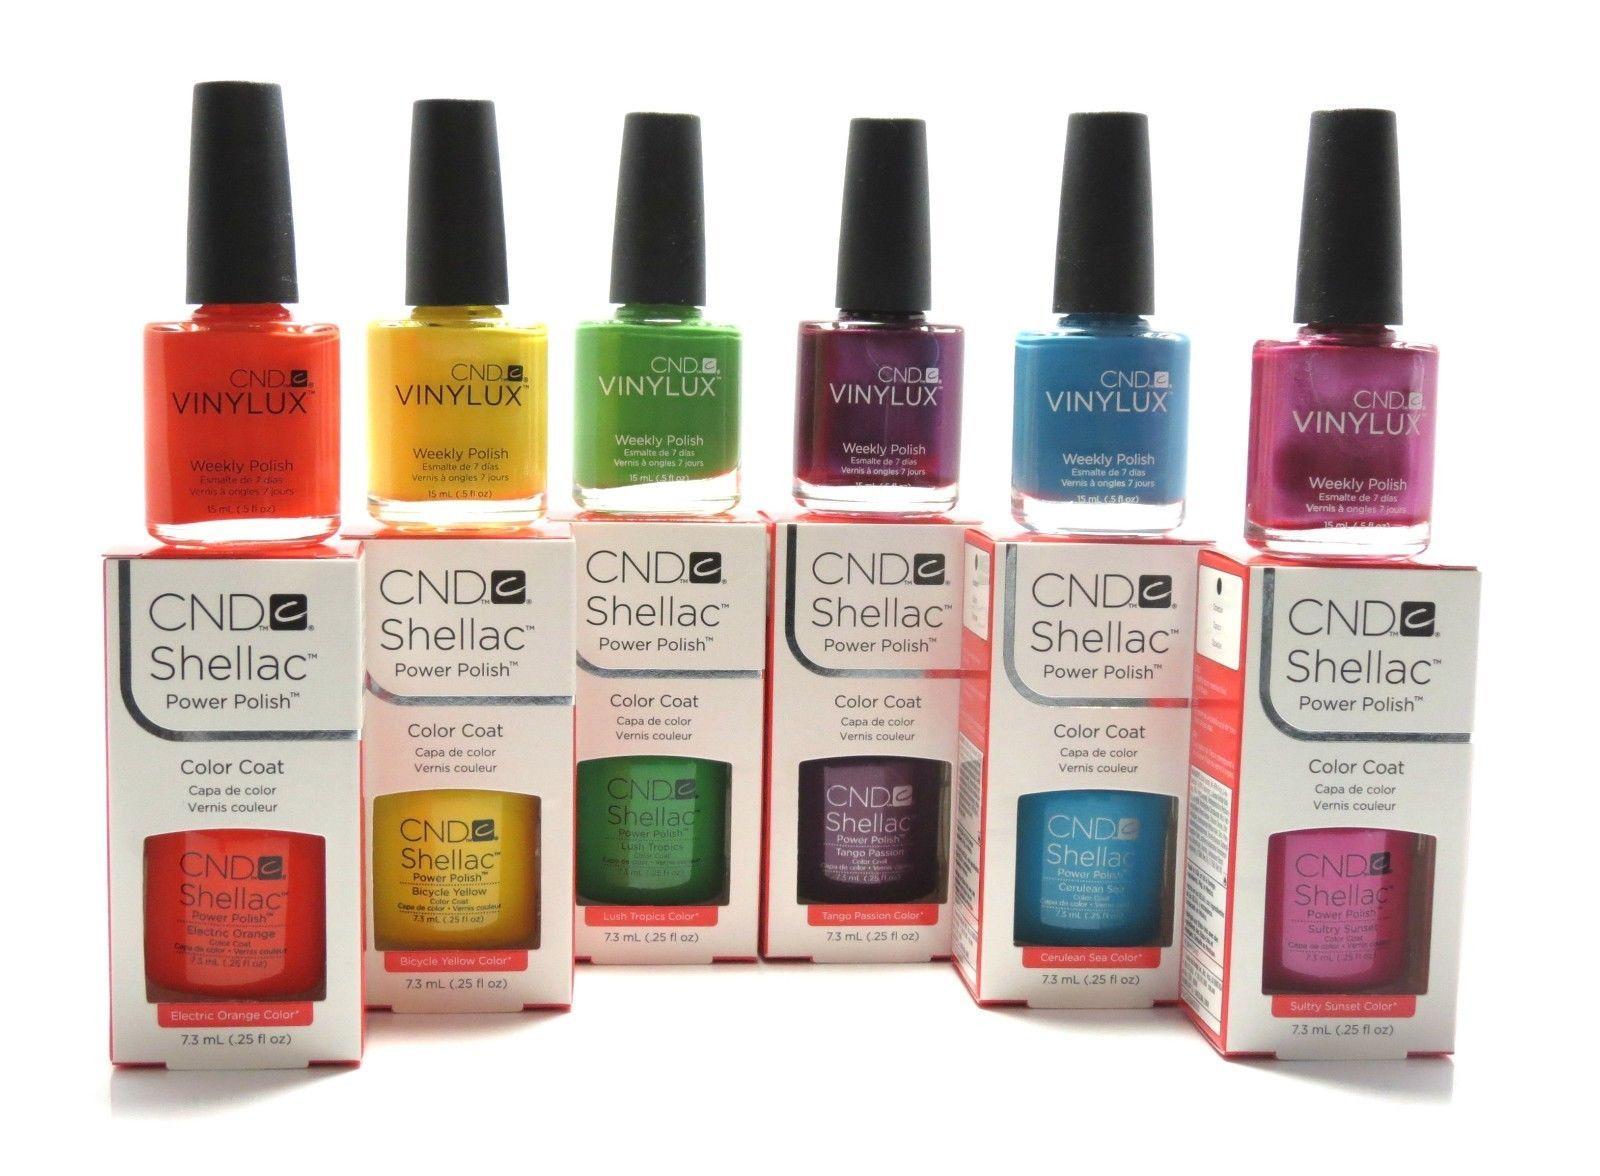 CND Shellac Colors 2014